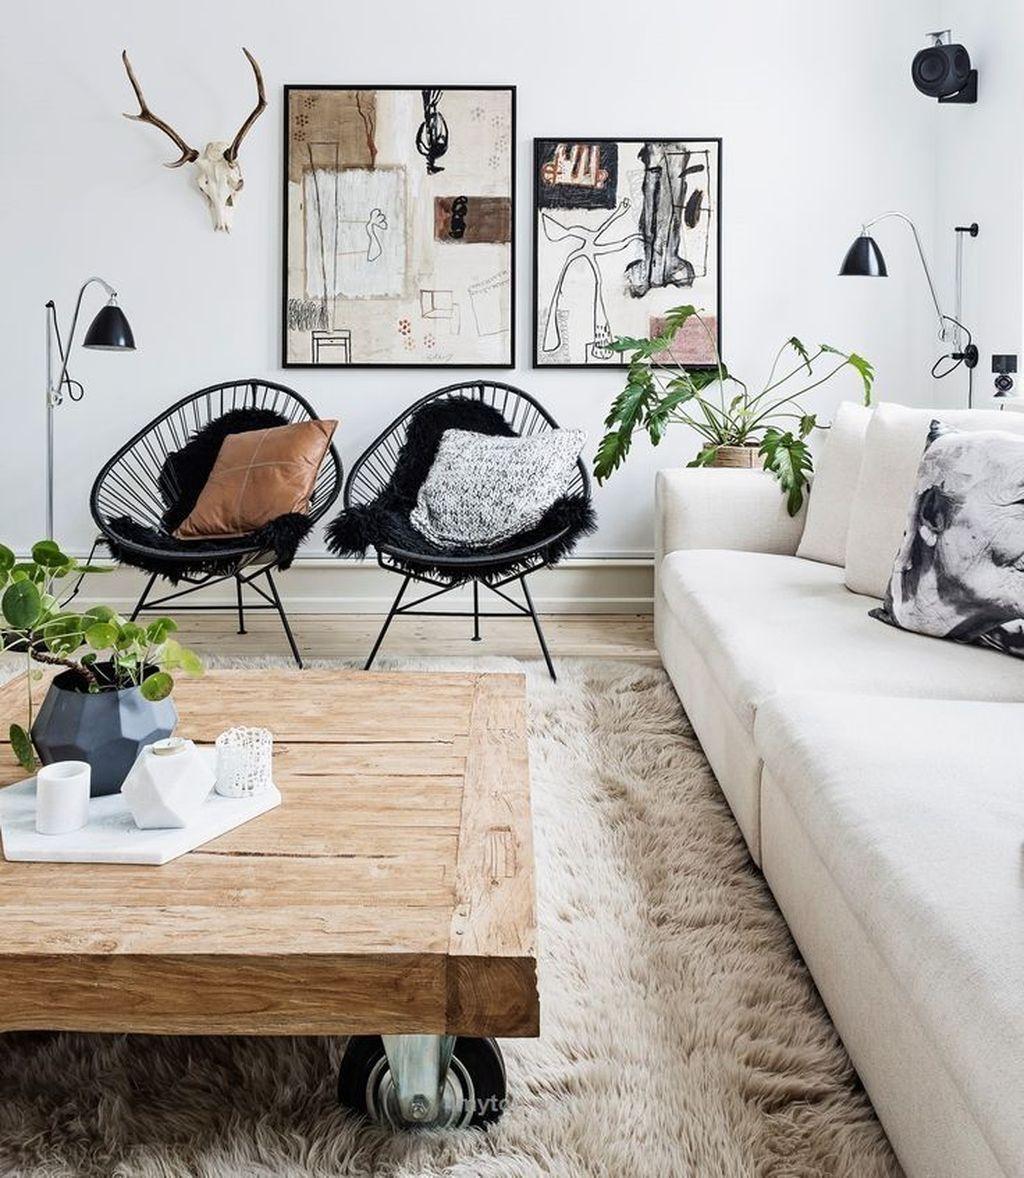 46 Beautiful And Minimalist Dorm Room Decoration Ideas On A Budget ...